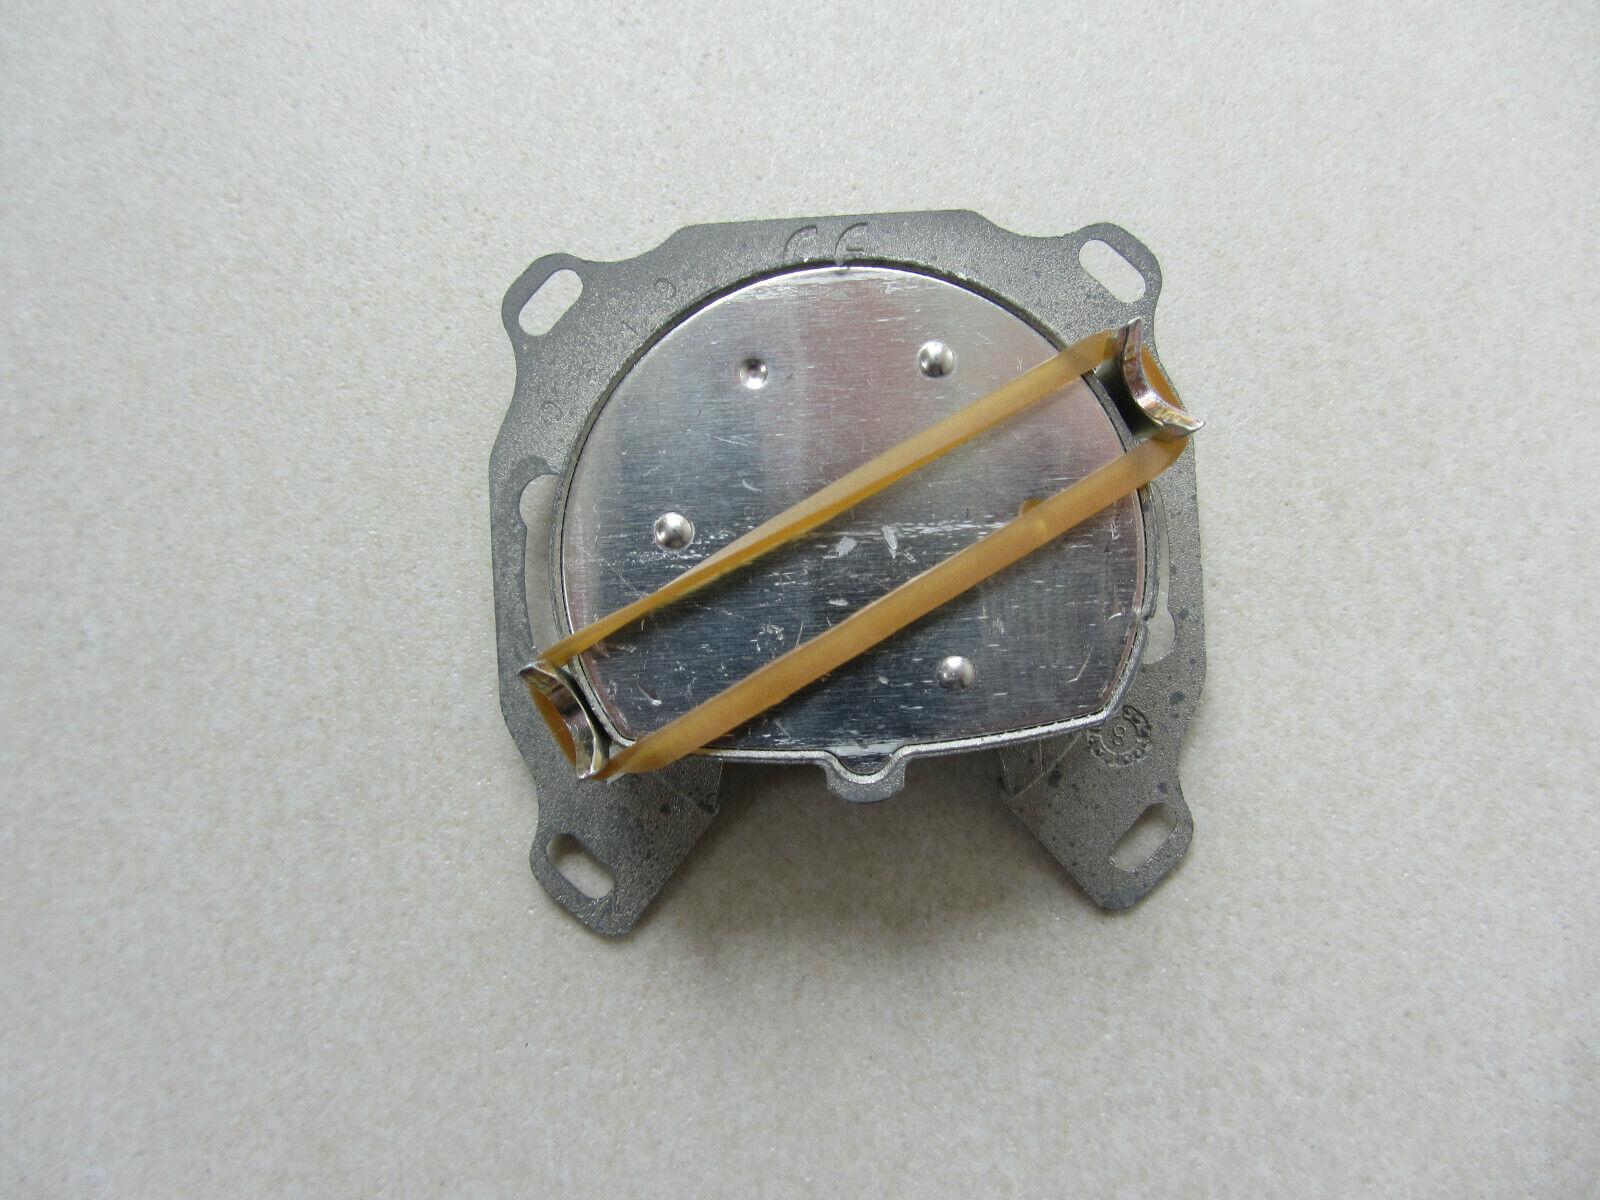 Astro bien 121 stichdose Antennes Prise de courant 2.2 DB 00540811 980